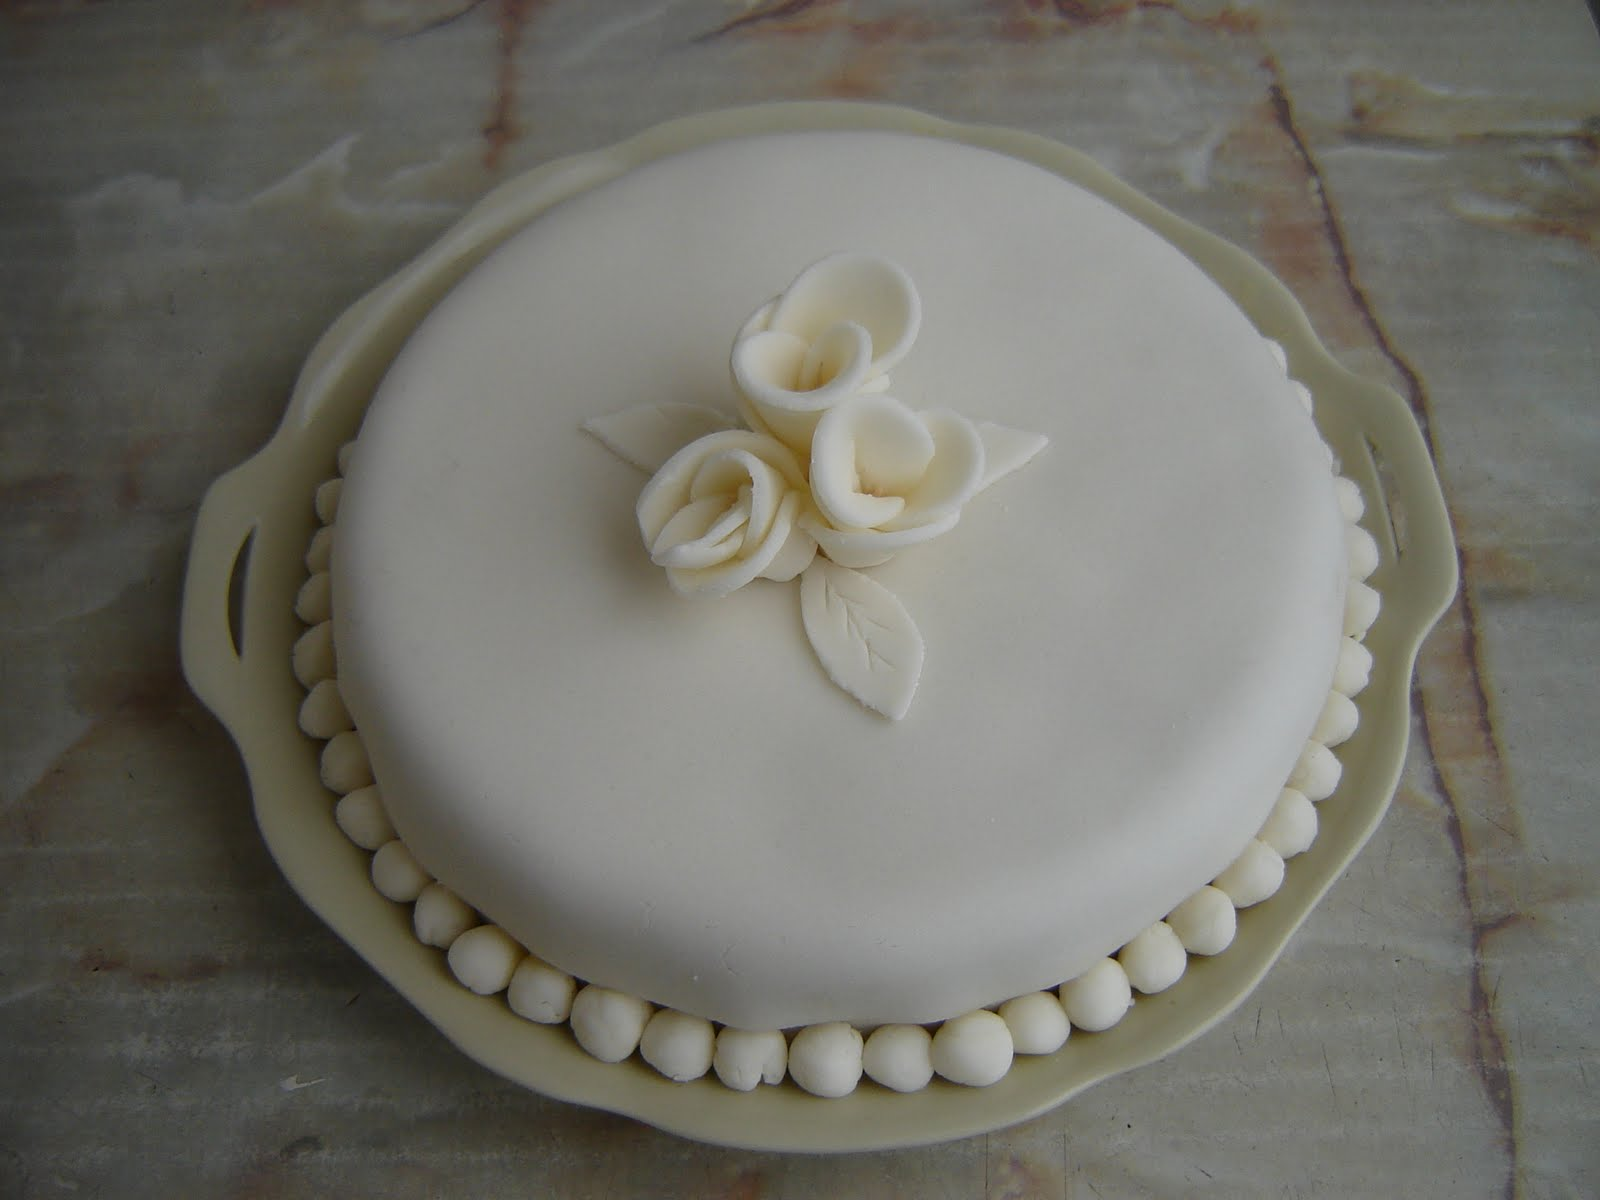 Pyszna Dieta Tort Dla Alergika Bez Mleka I Jajek